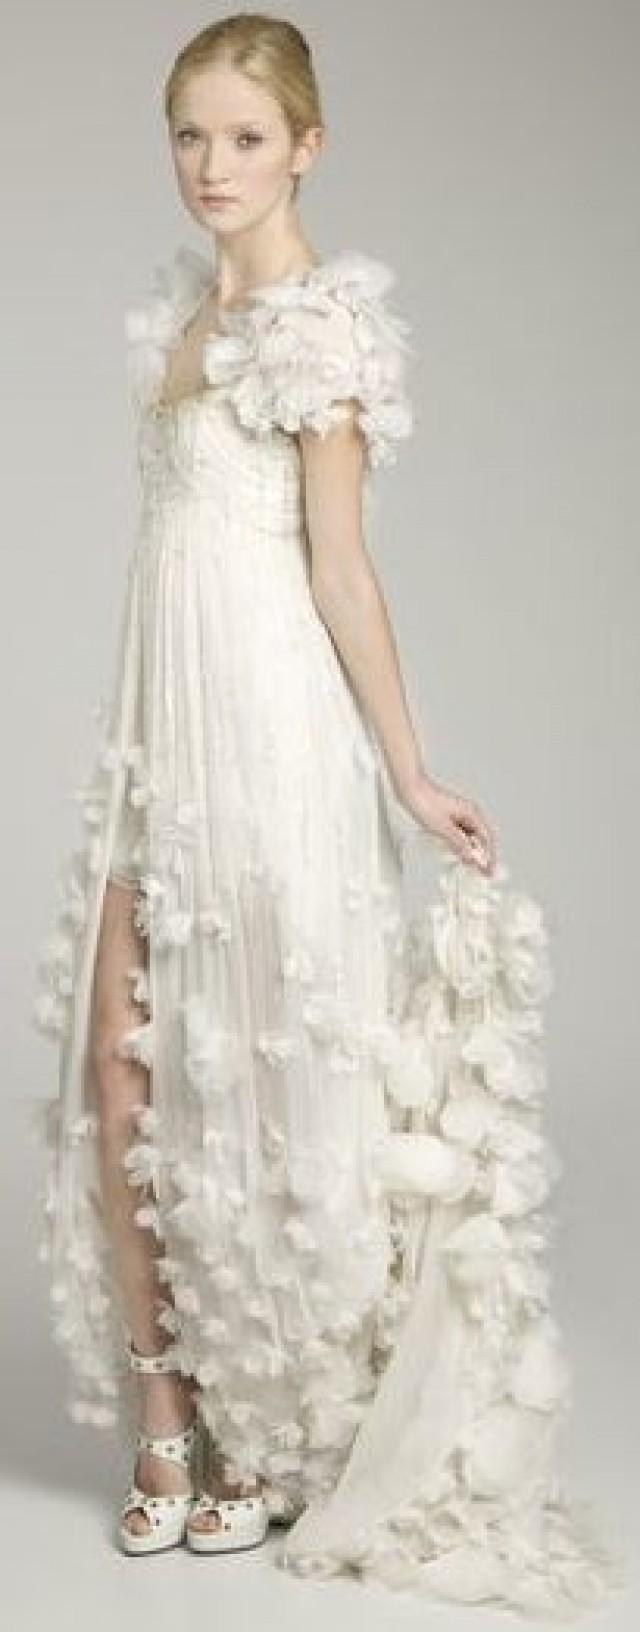 Fairy Wedding Bohemian Dress 2054029 Weddbook